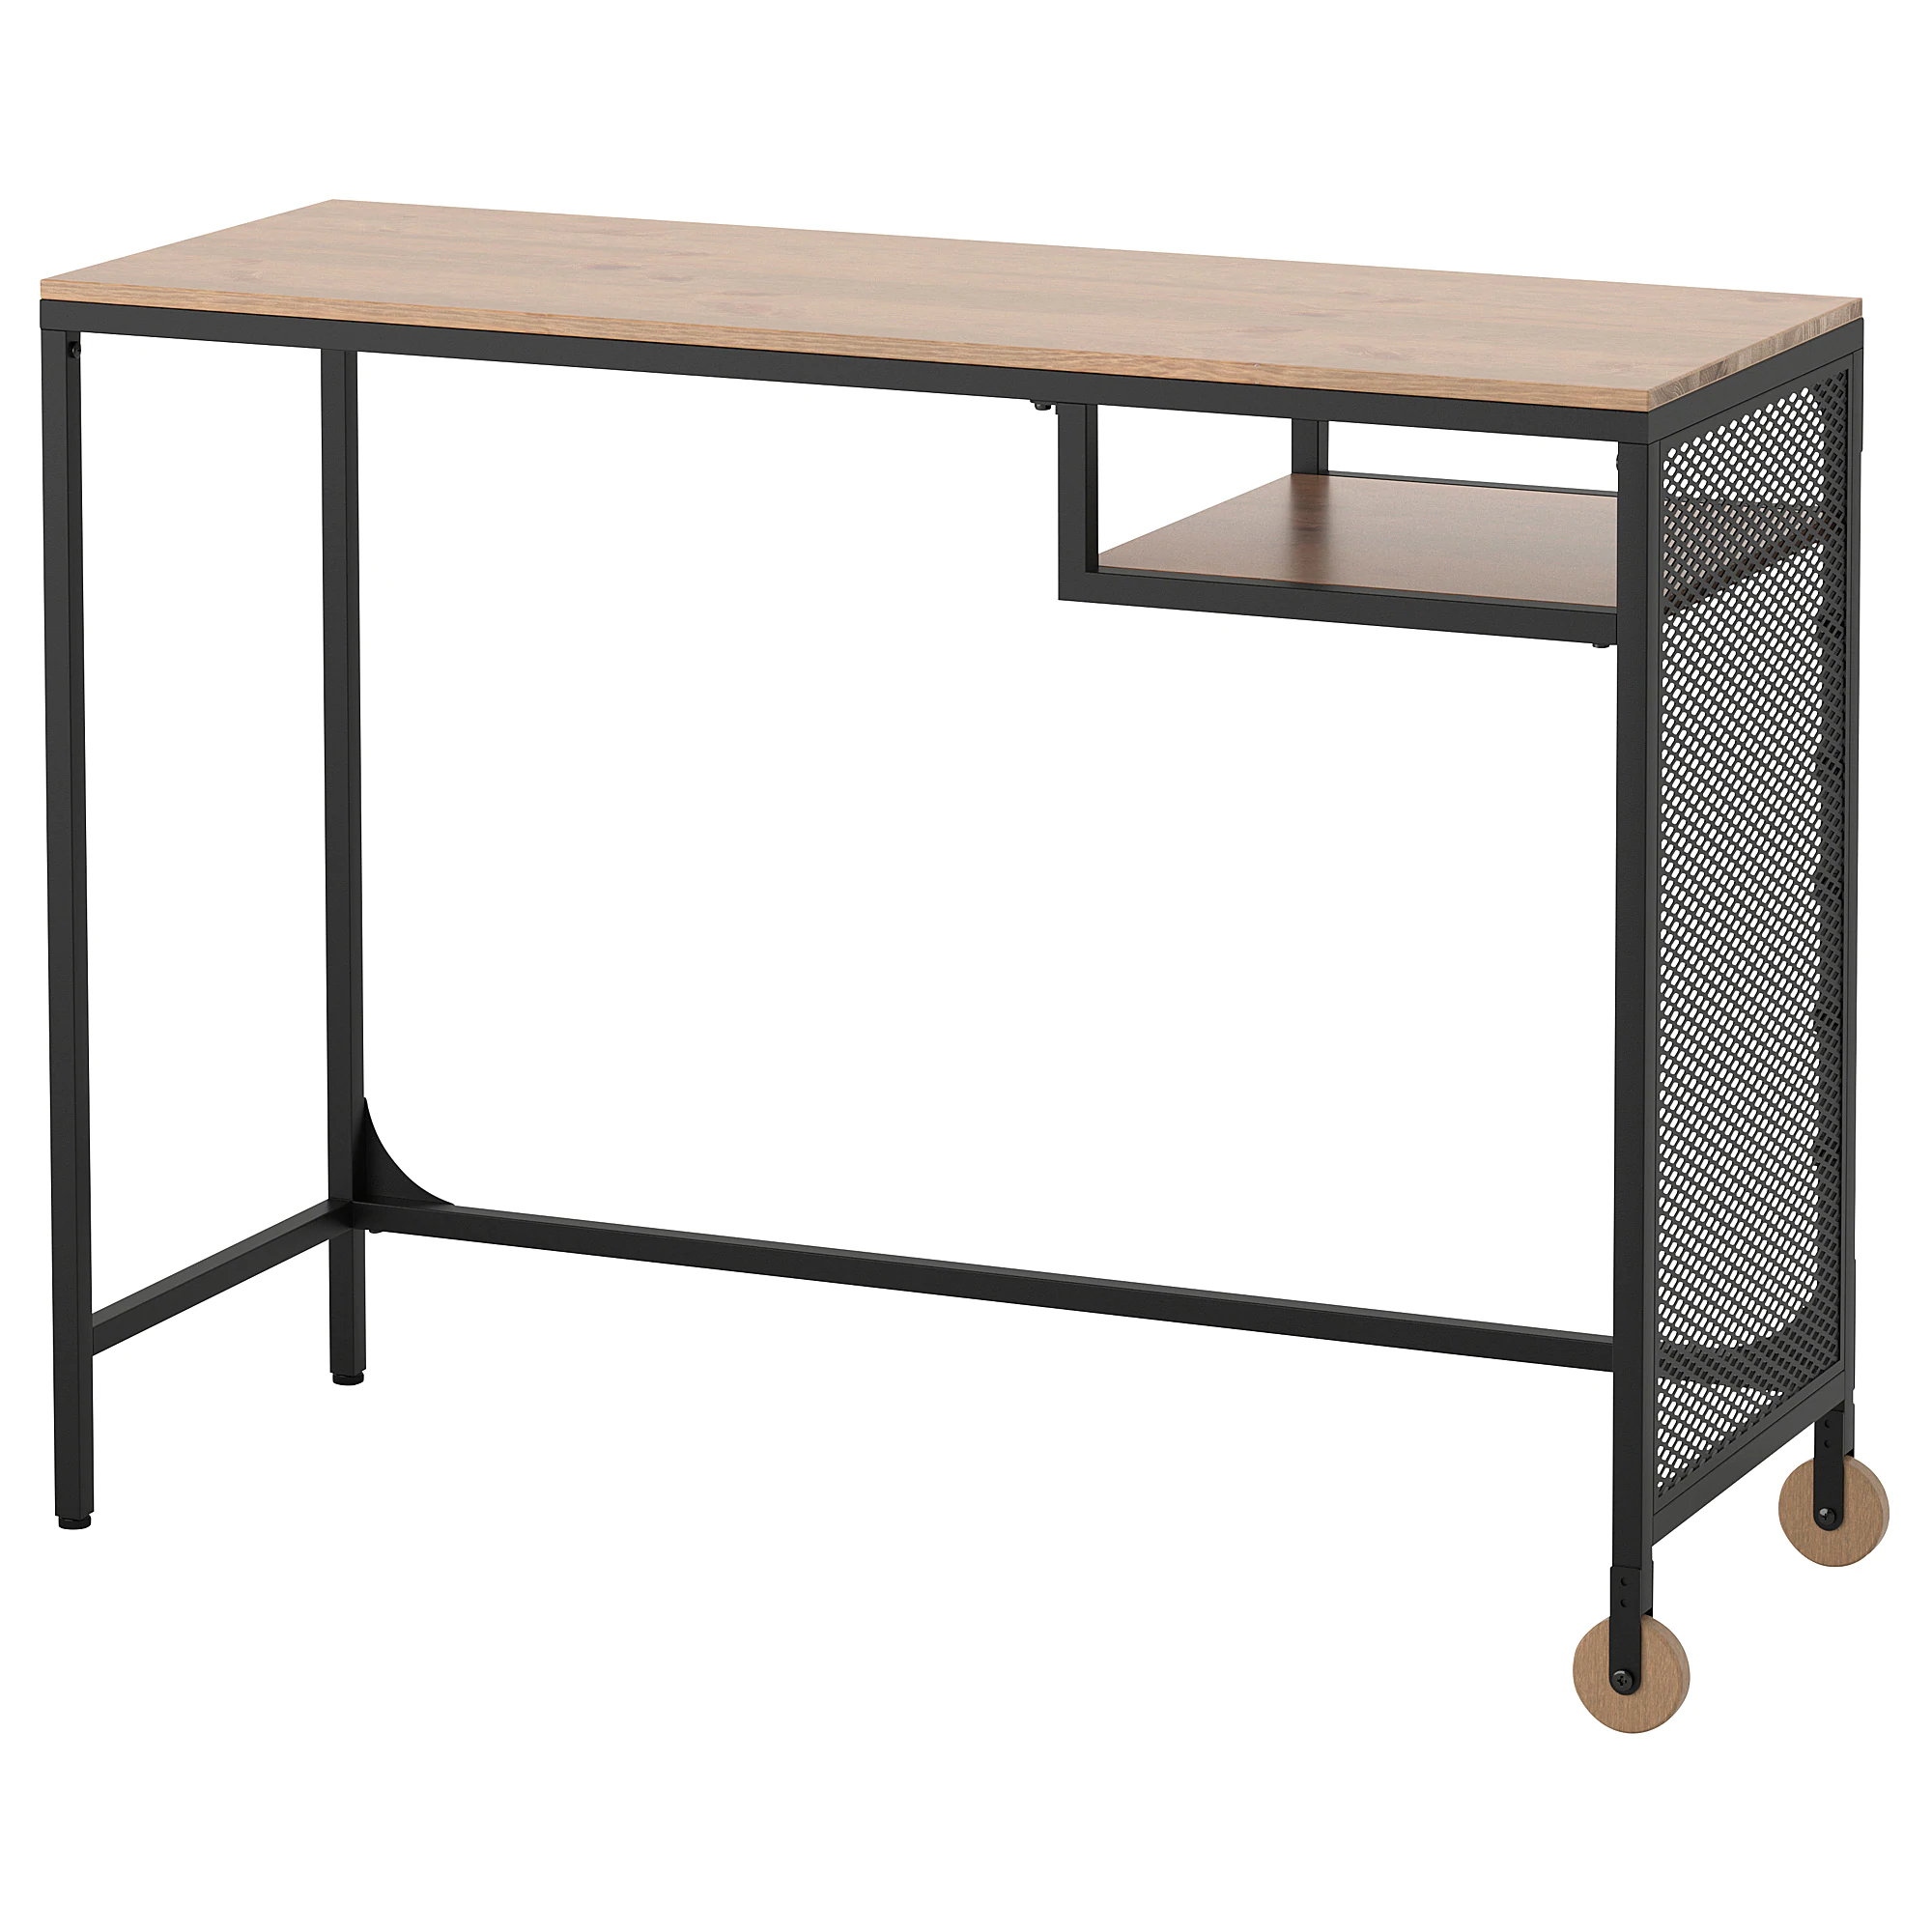 Fjallbo Laptop Table Black 39 3 8x14 1 8 Ikea In 2020 Laptop Table Furniture Ikea Laptop Table [ 2000 x 2000 Pixel ]